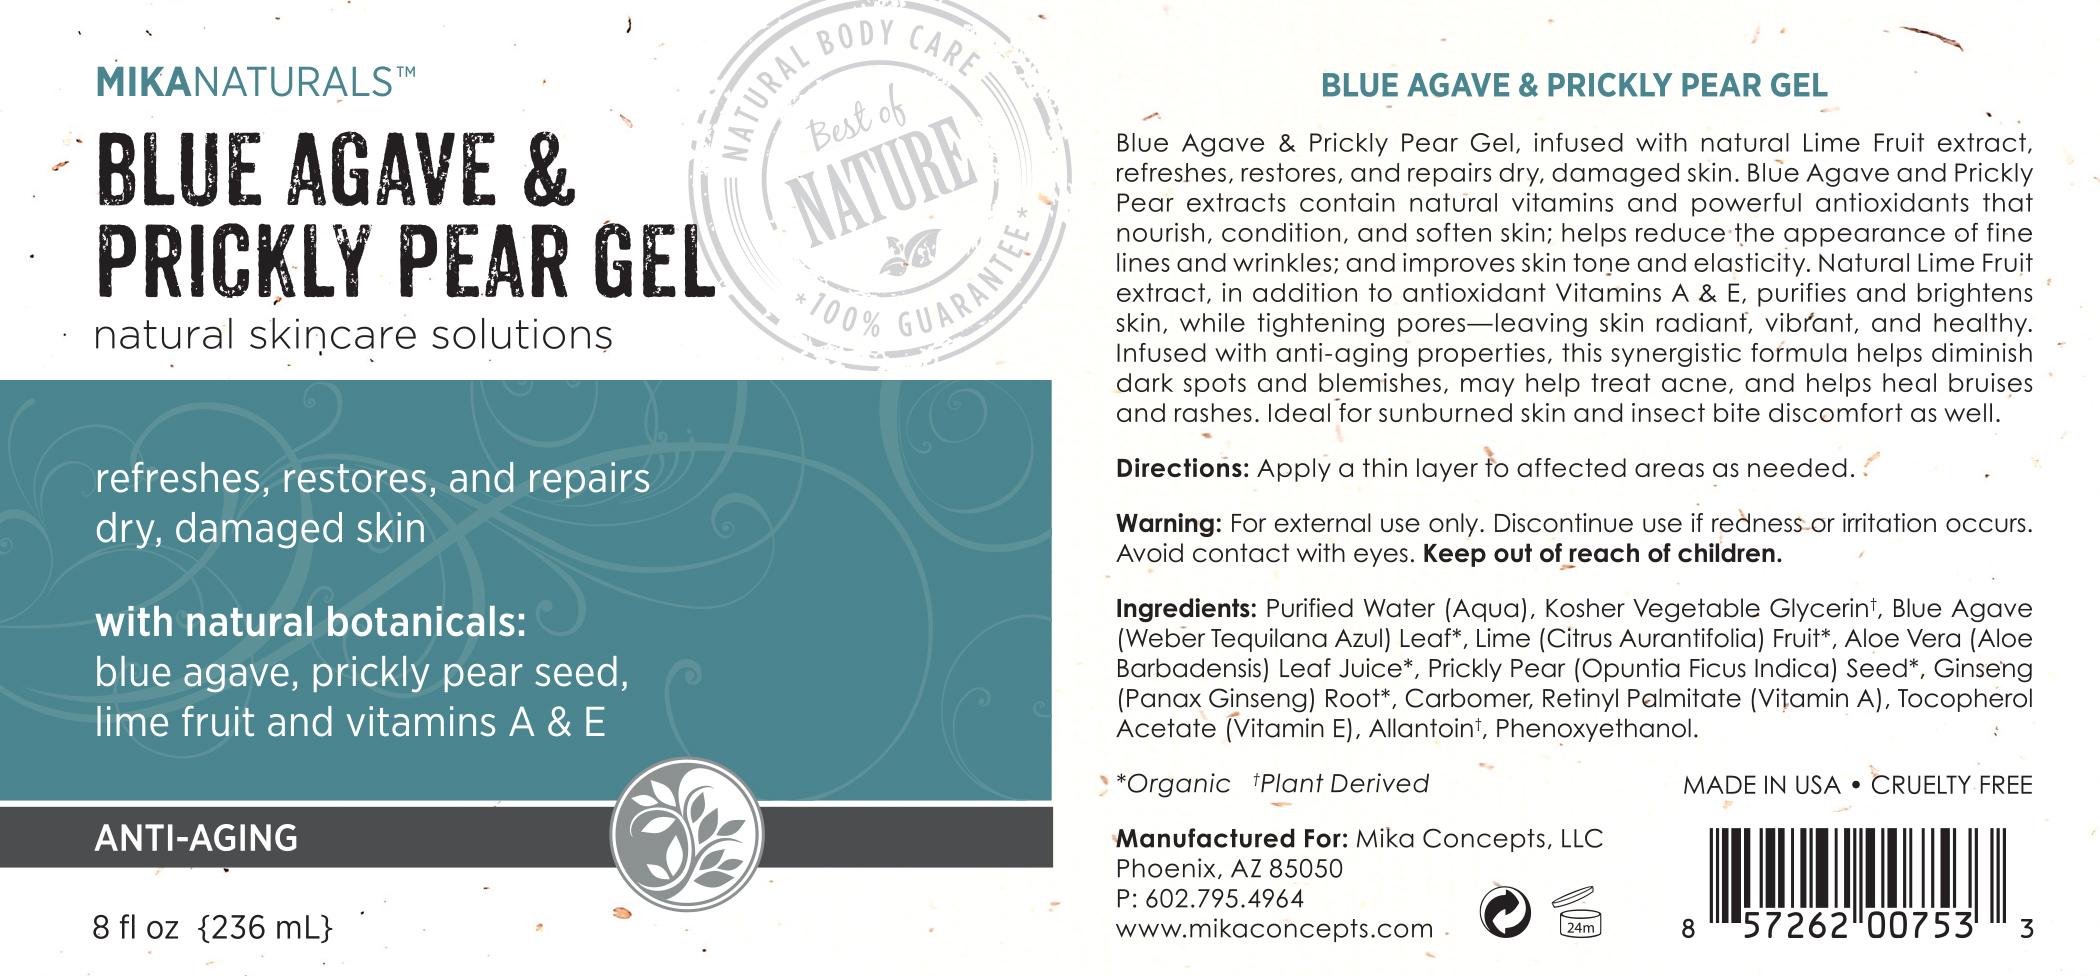 Mika Naturals™ BLUE AGAVE & PRICKLY PEAR GEL (8oz) 236ml